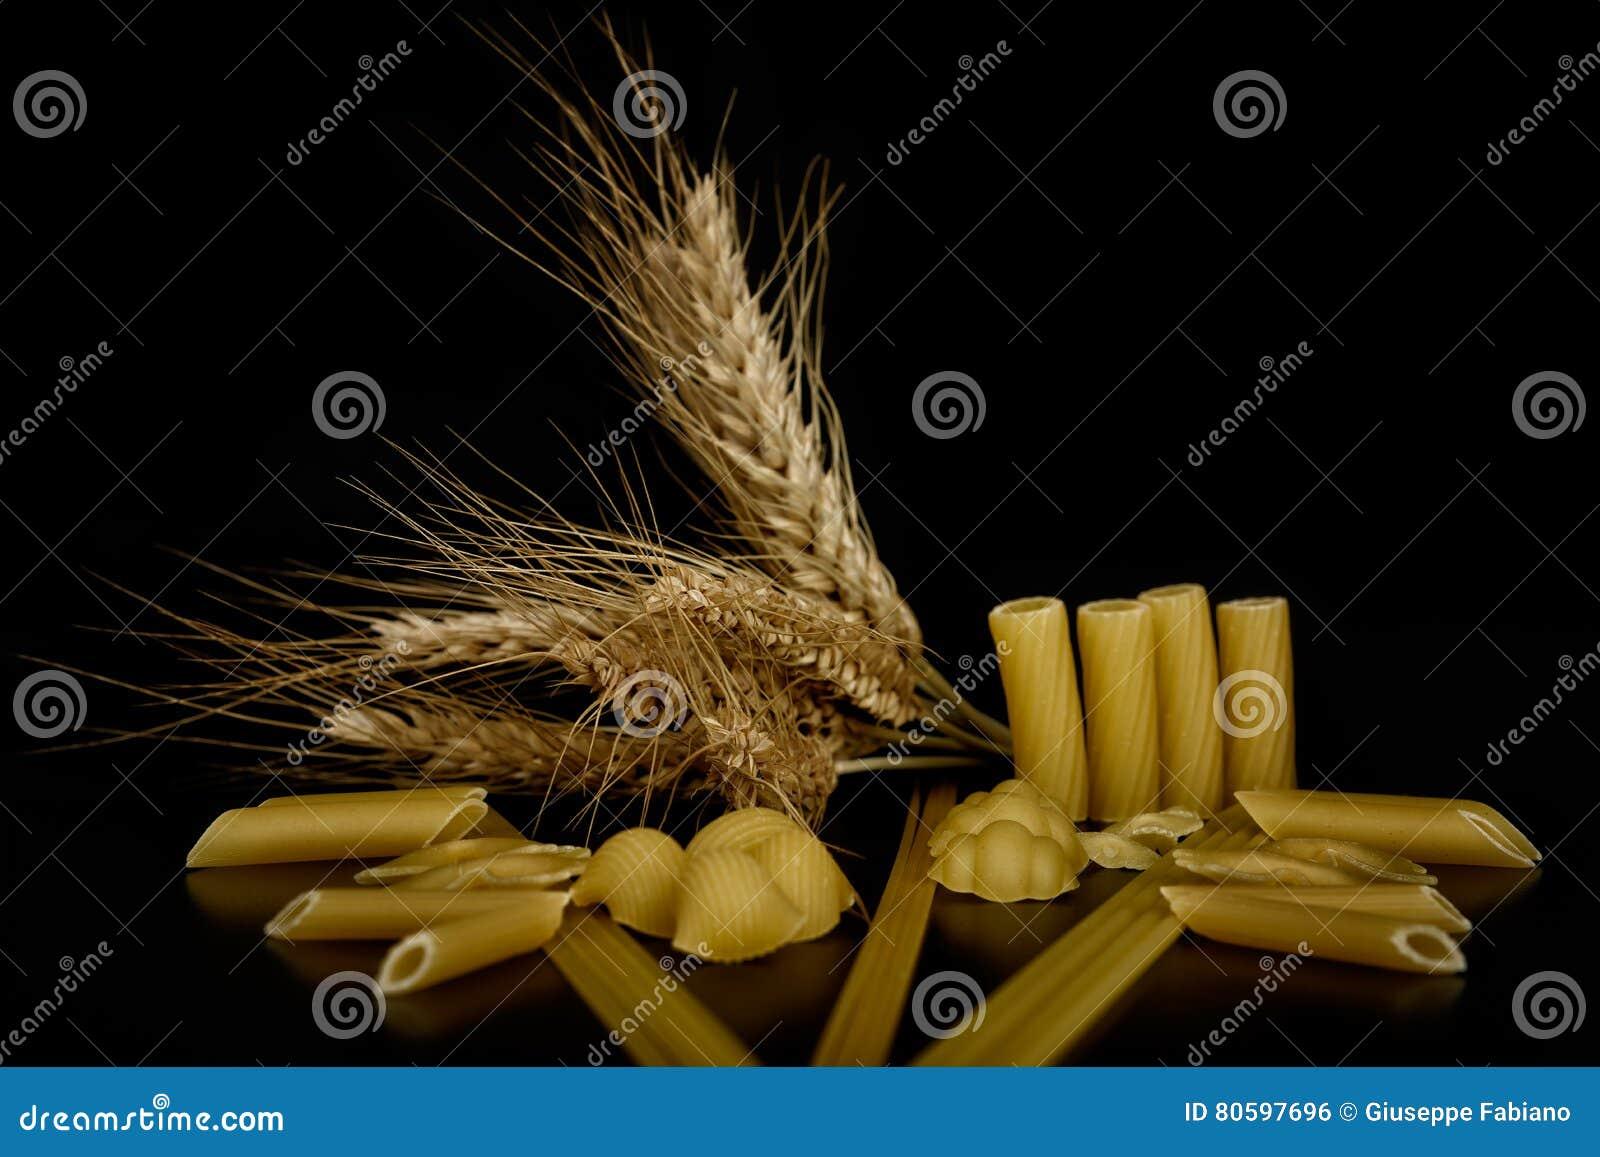 The children of grain